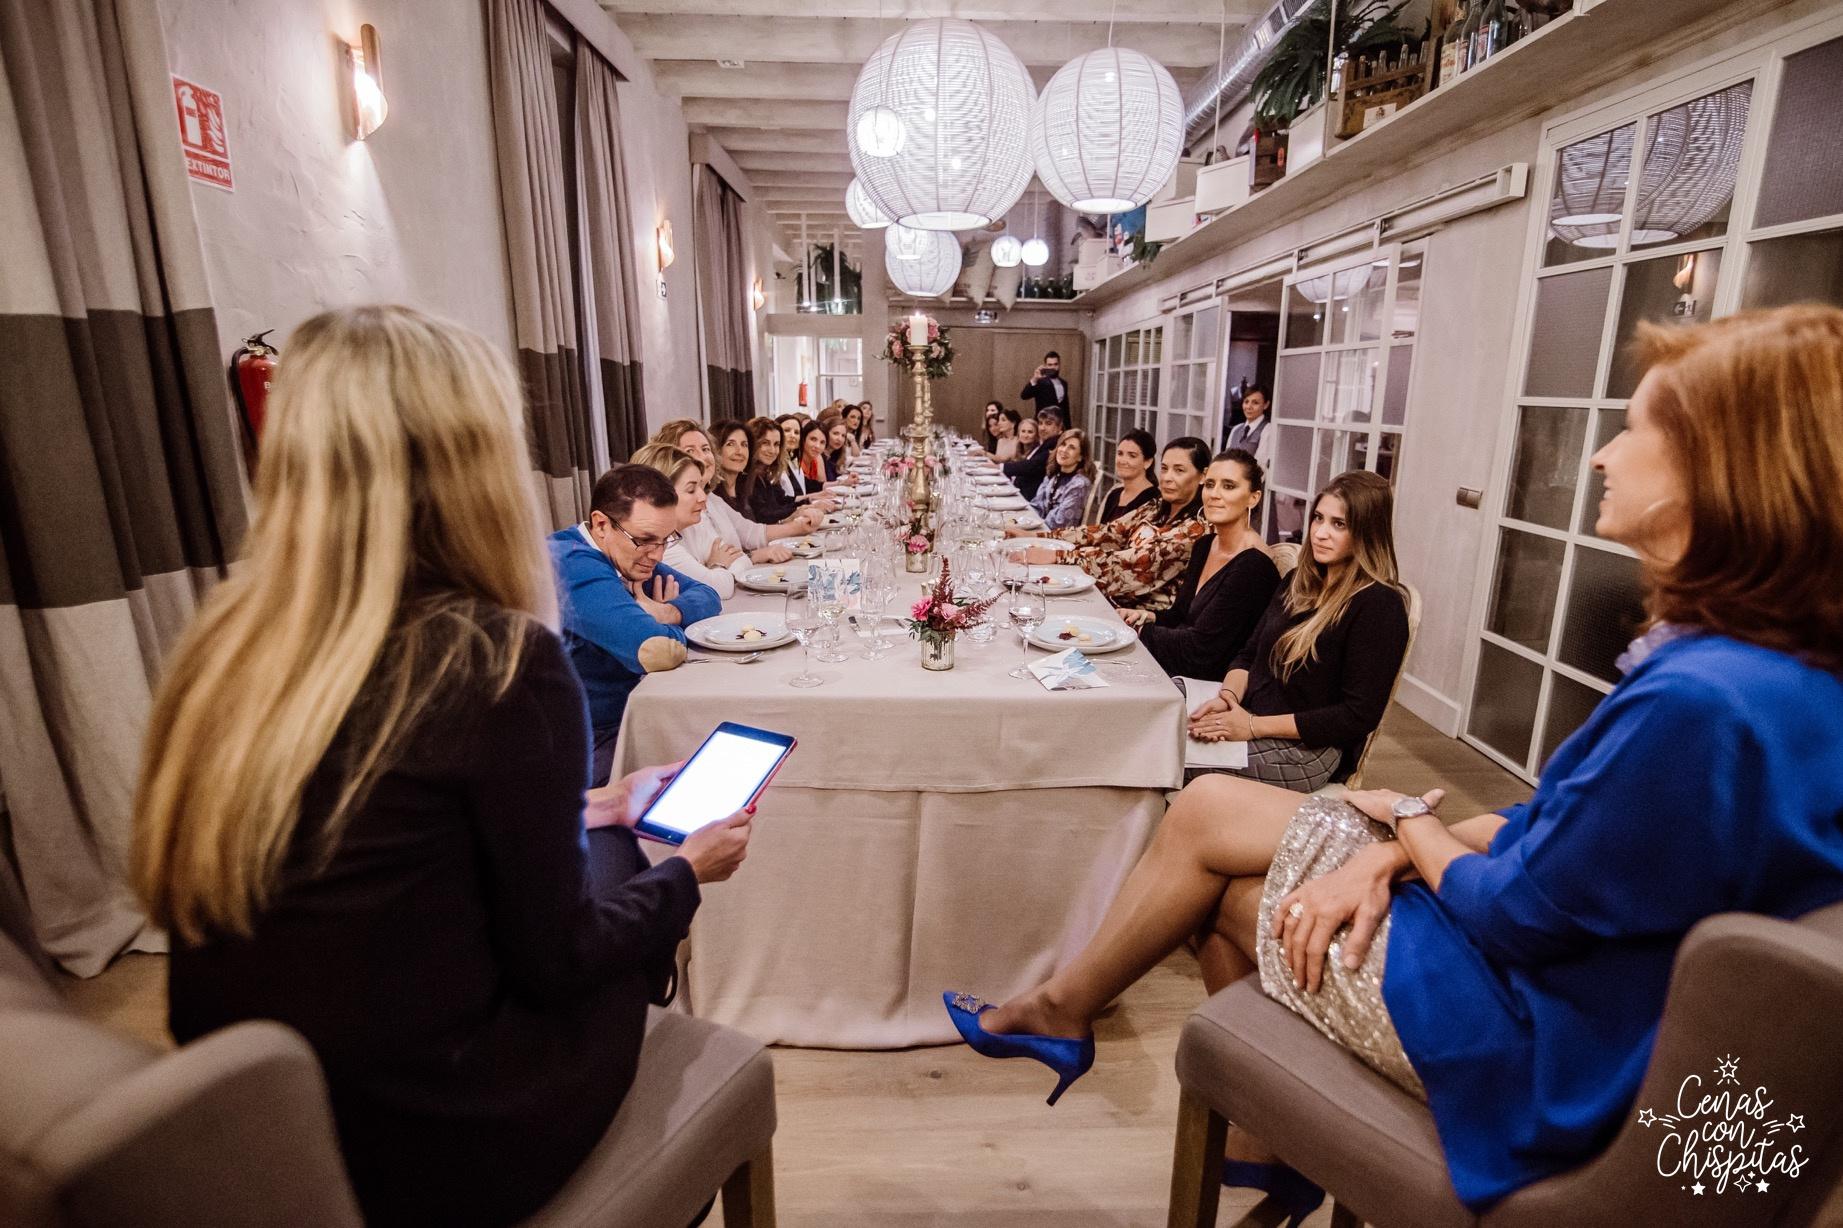 Marta Pérez Dorao Cenas con Chispitas